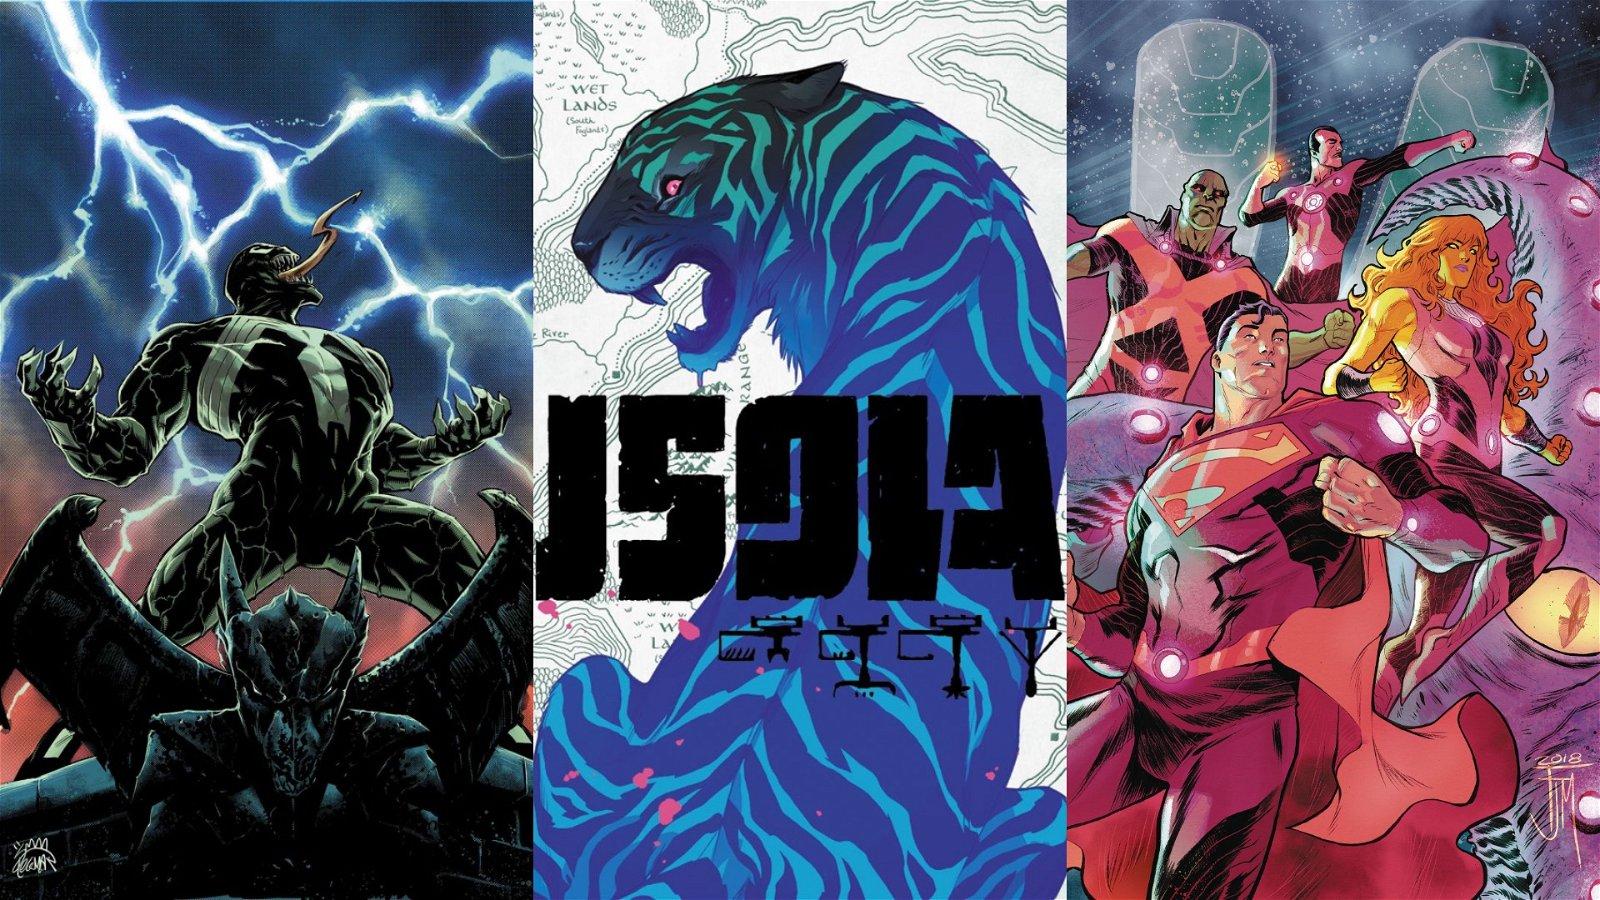 Best Comics to Buy This Week: Featuring Venom #1